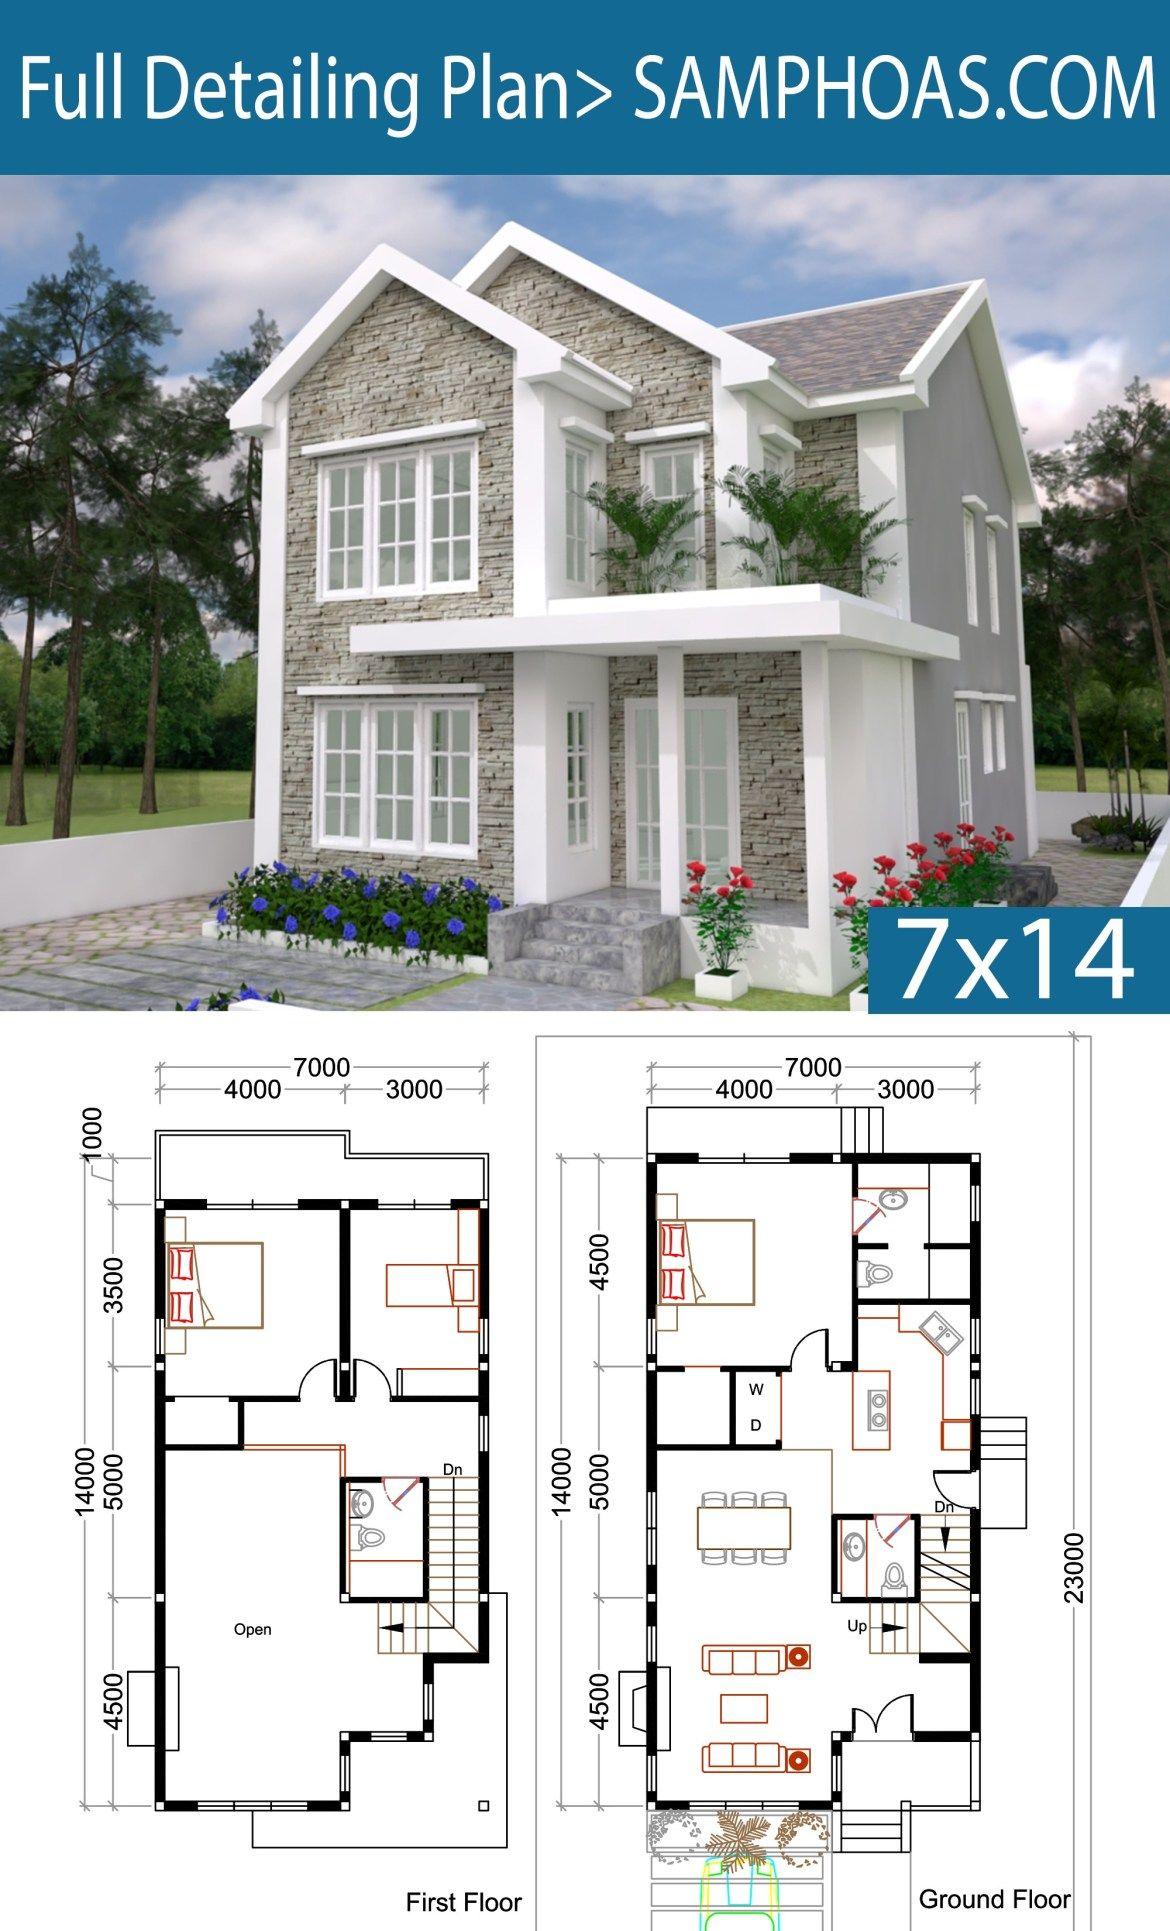 3 Bedrooms Home Plan 7x14m Samphoas Plansearch Sims House Plans House Plans Sims House Design